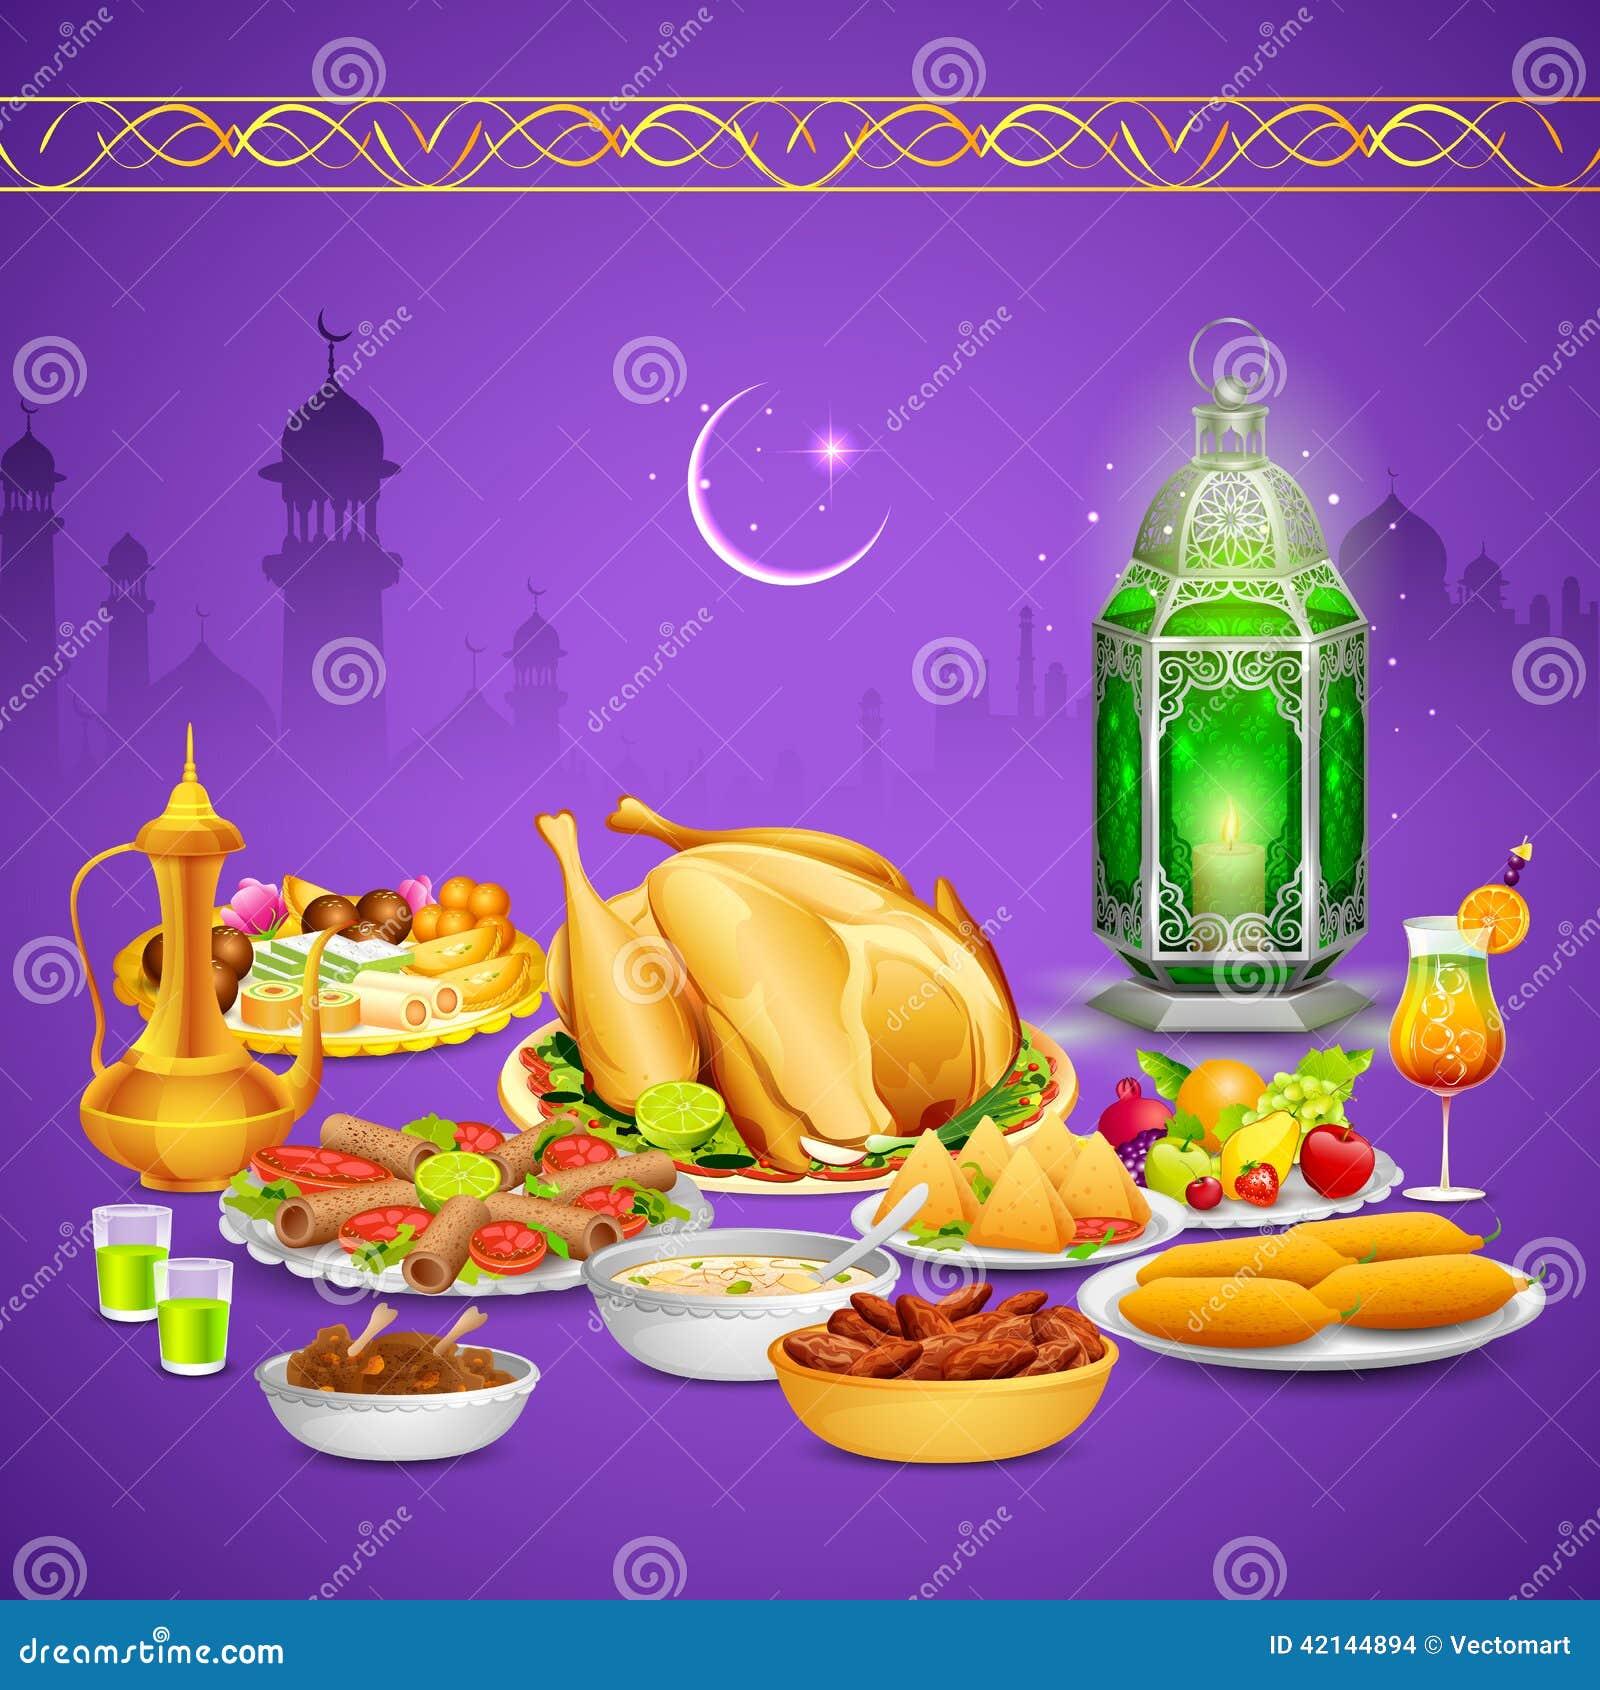 Iftar Stock Illustrations – 2,597 Iftar Stock Illustrations, Vectors ... for Ramadan Iftar Clipart  17lplyp